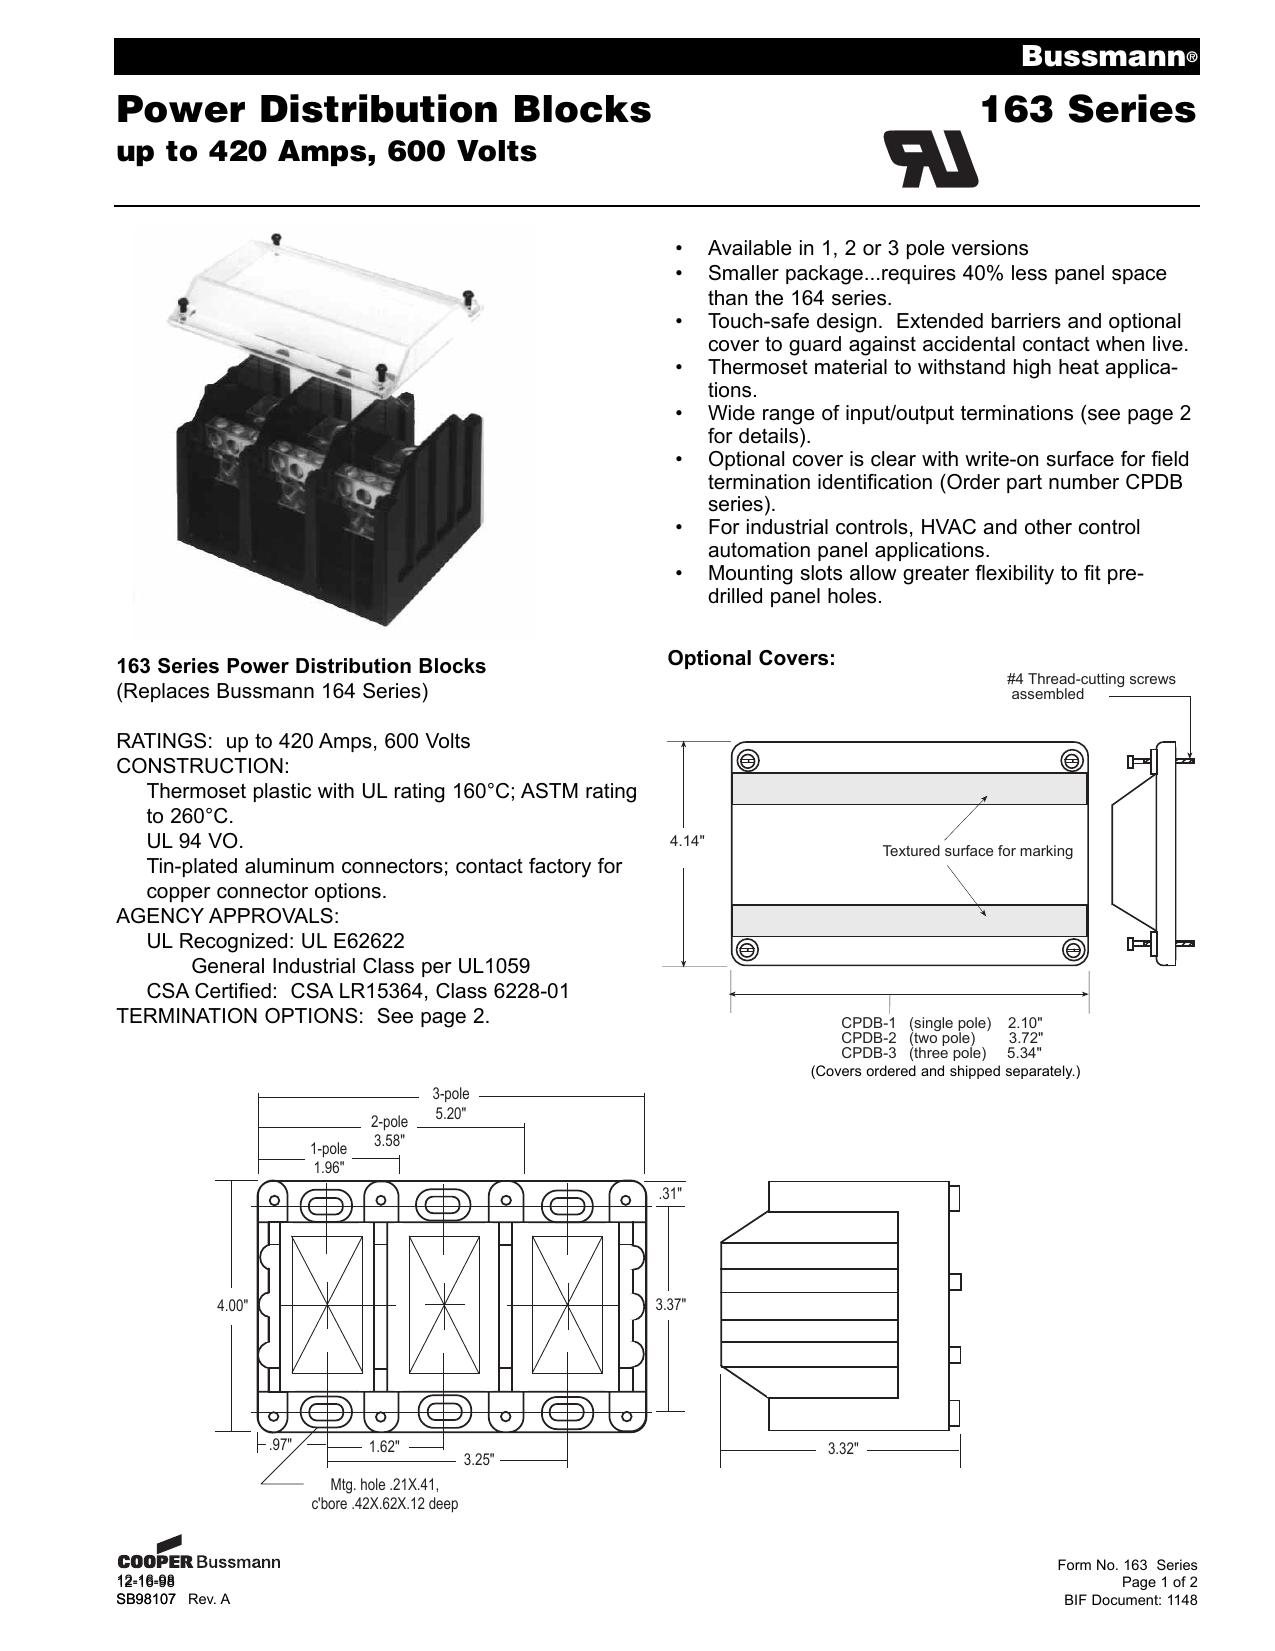 BUSSMAN CPDB-3 CLEAR COVER NEW NO BOX